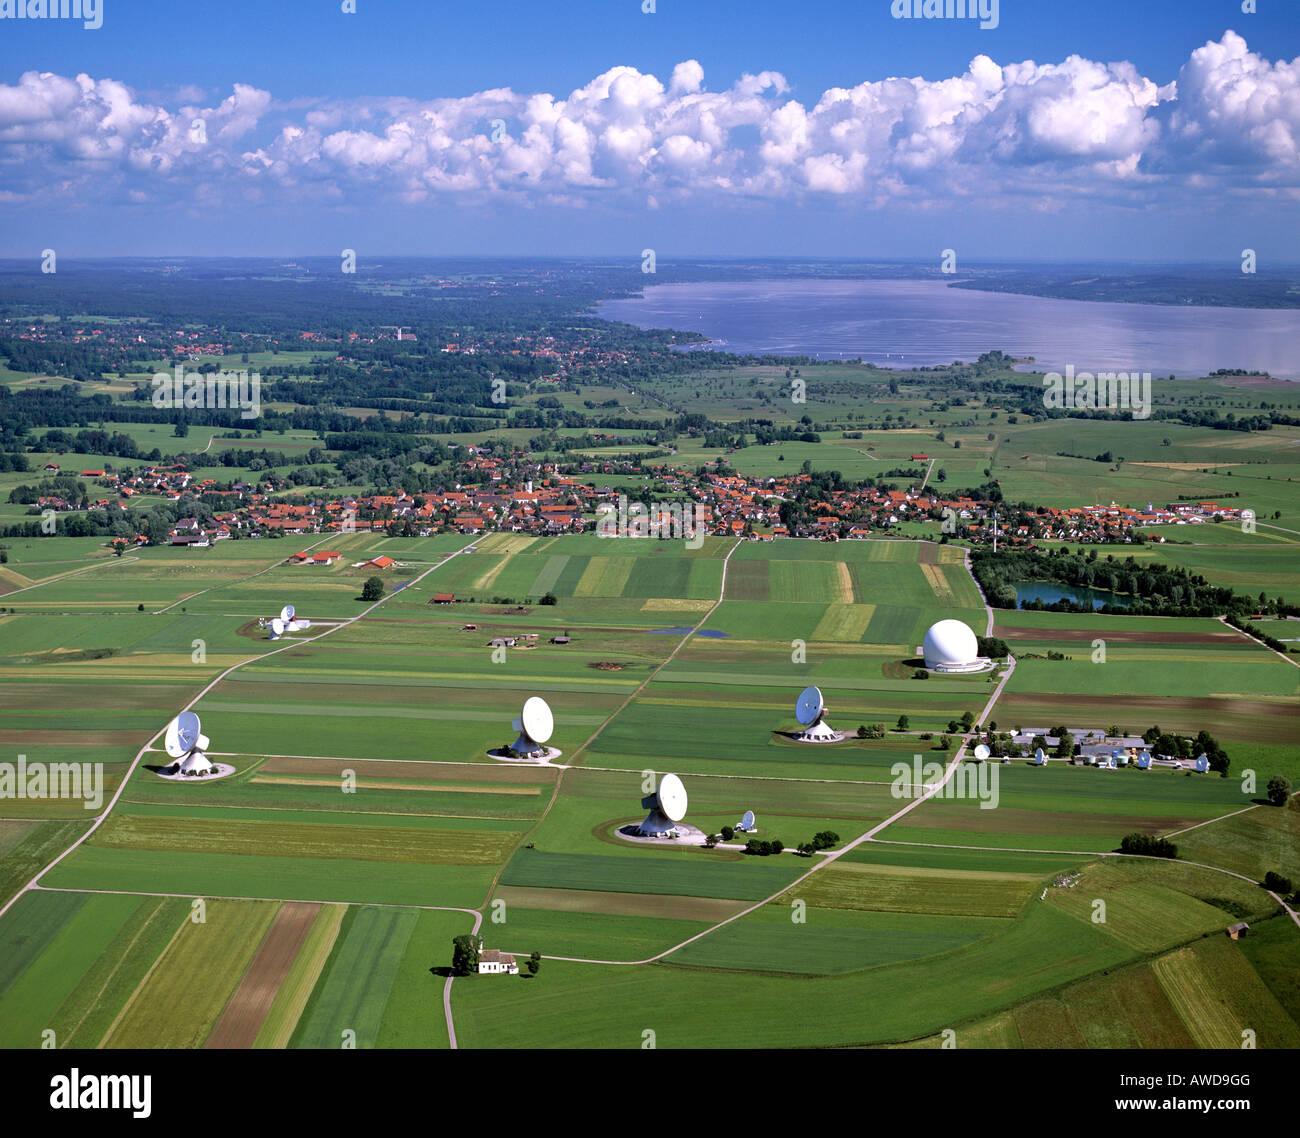 Satellite Earth Station Raisting, Ammersee (Lake Ammer), aerial view, Upper Bavaria, Bavaria, Germany - Stock Image